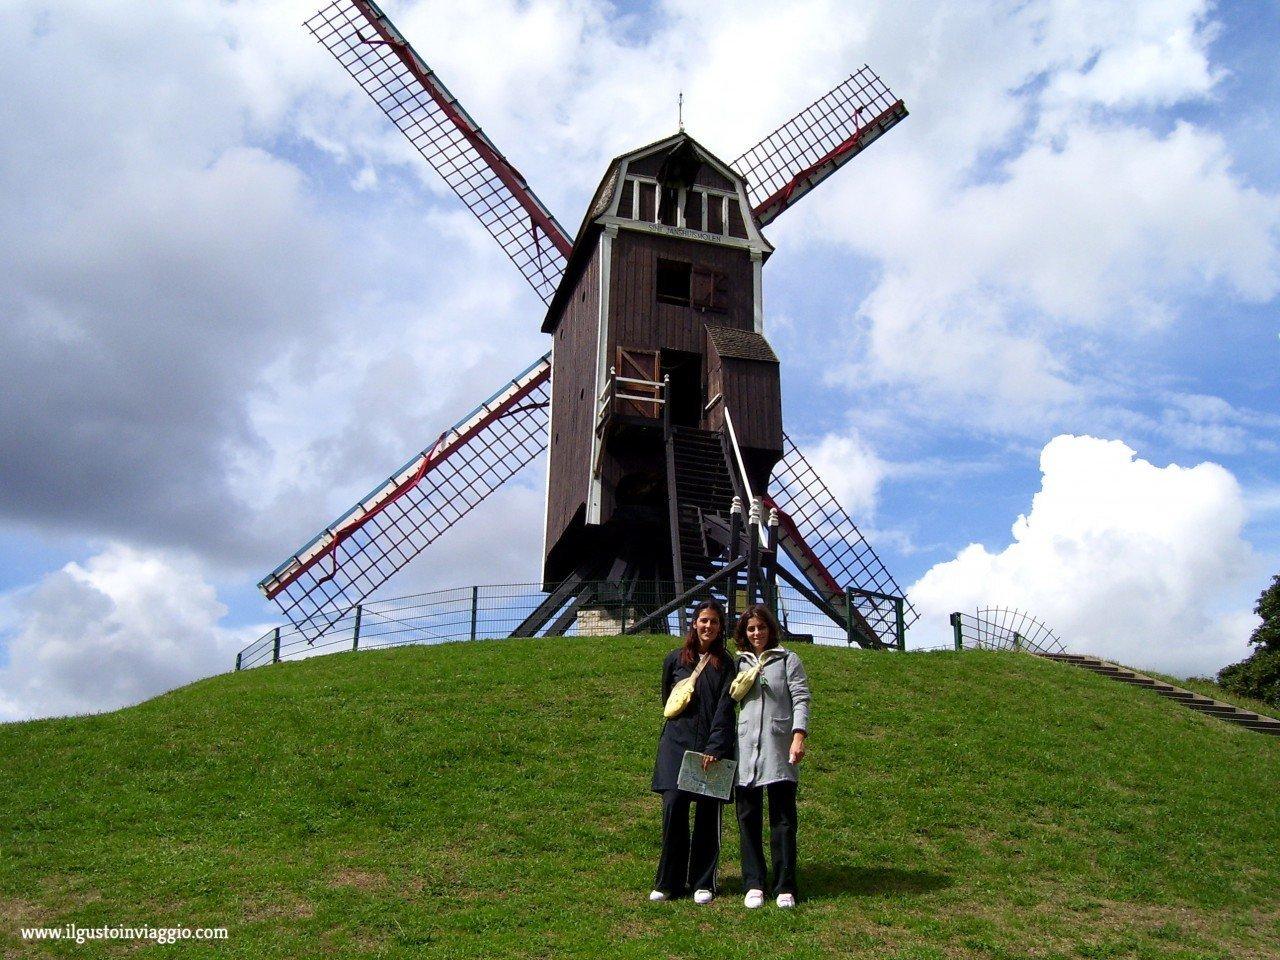 mulini a vento a bruges, sint janshuismolen mulini vento belgio